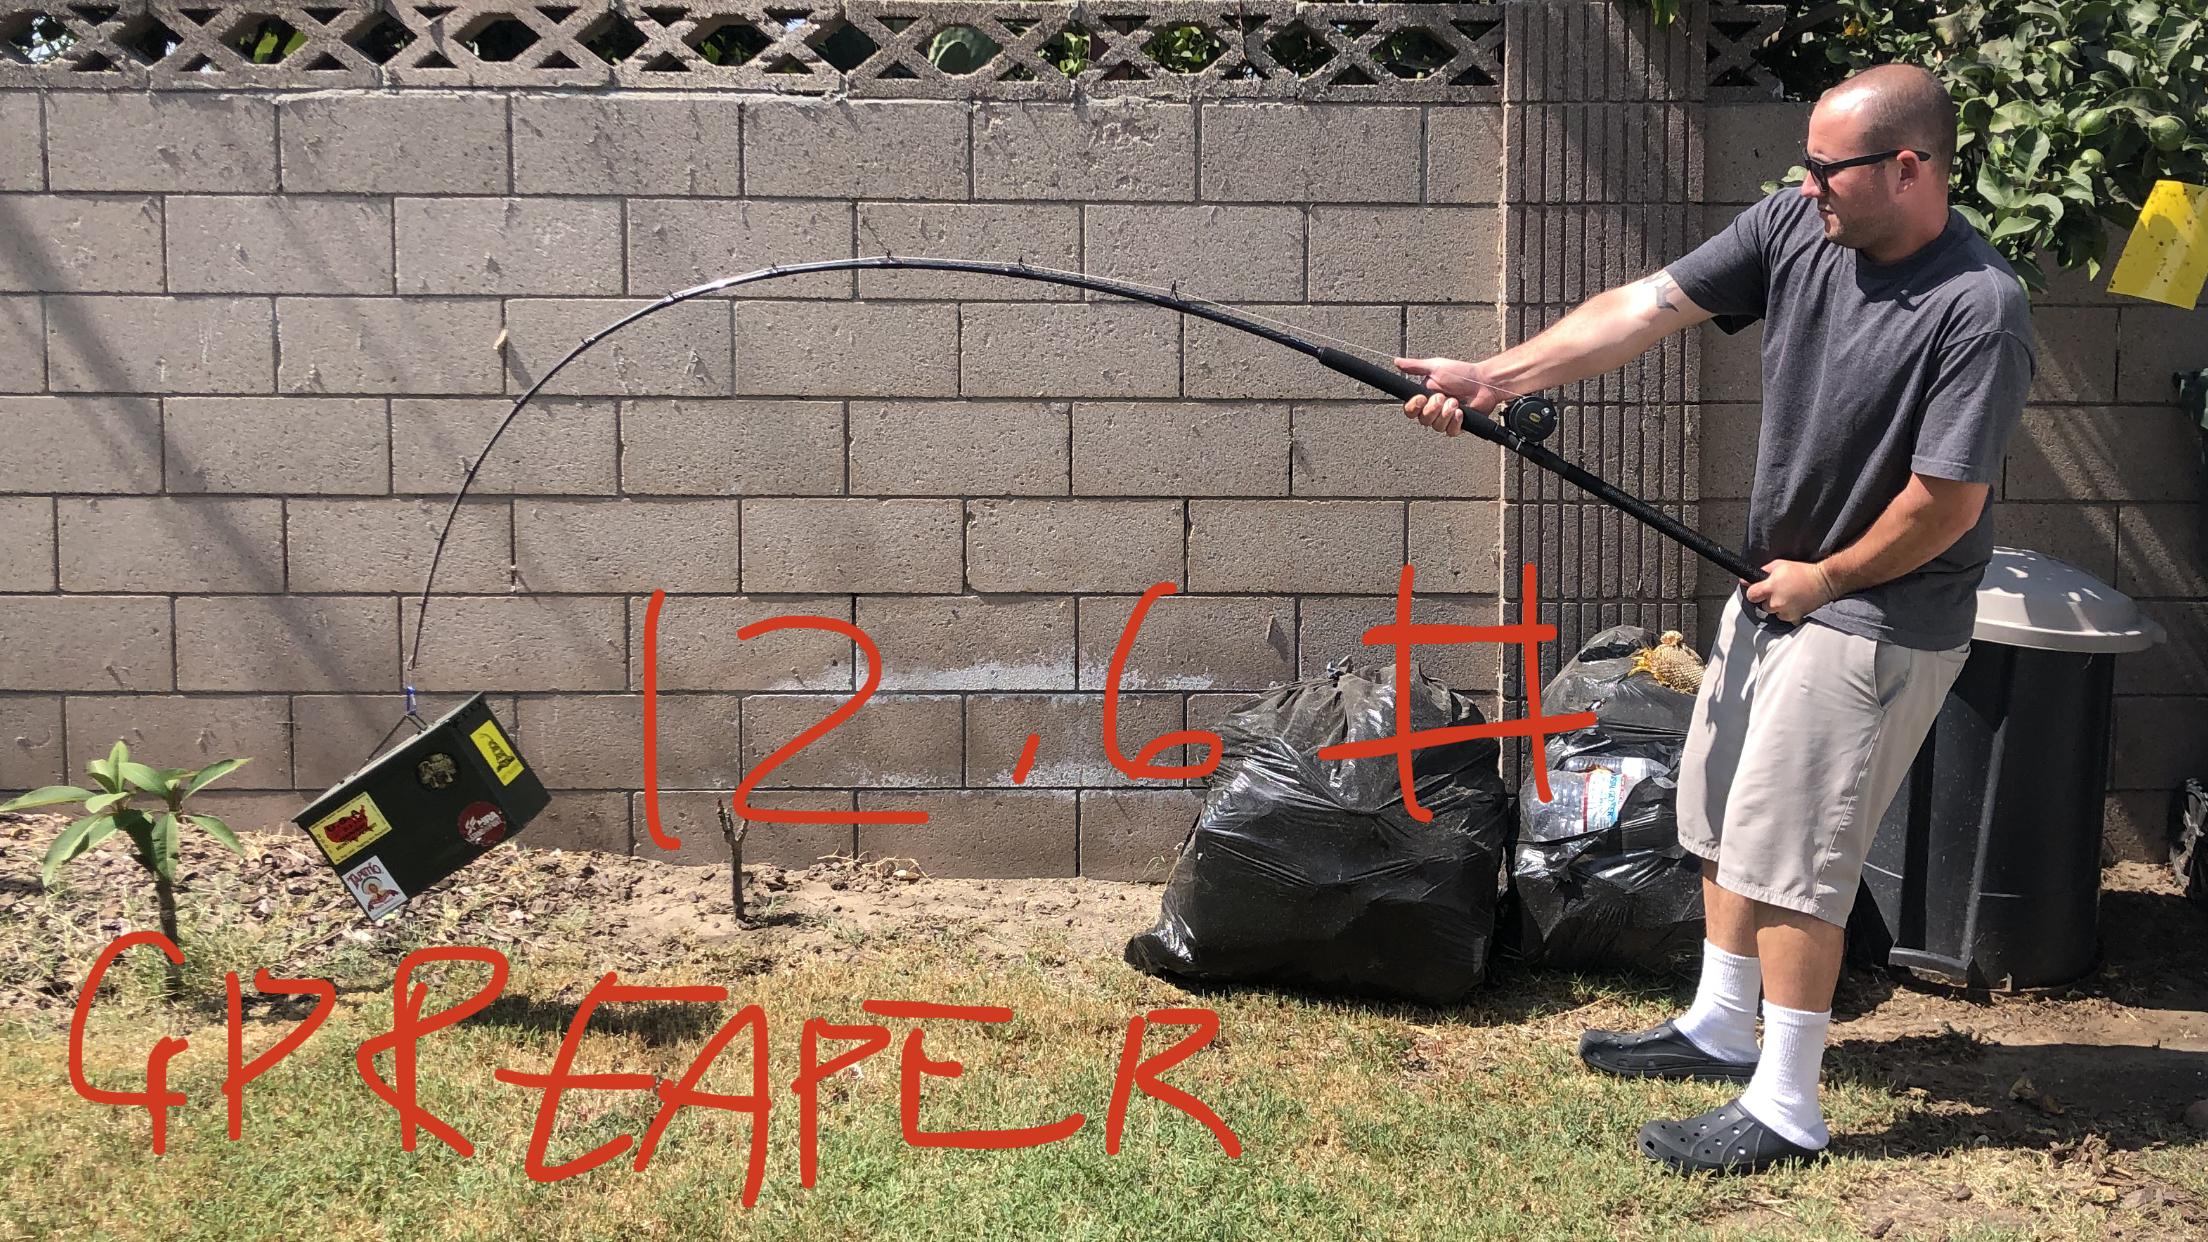 E7C1AEEF-71D4-4702-A7BB-E29EBB052865.jpeg